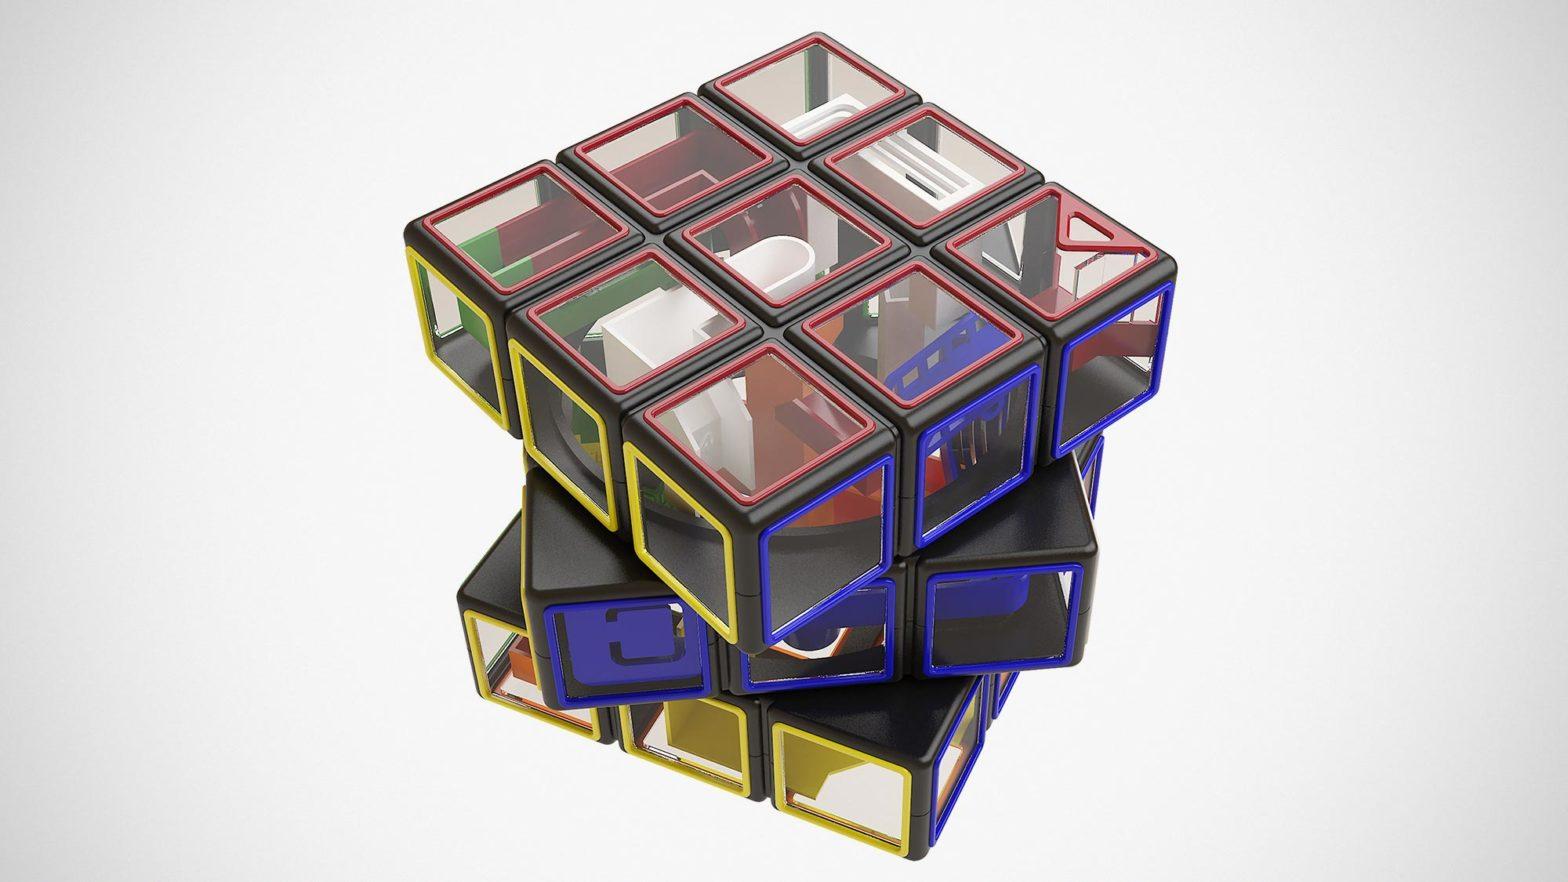 Rubik's Cube x Spin Master Perplexus Puzzles